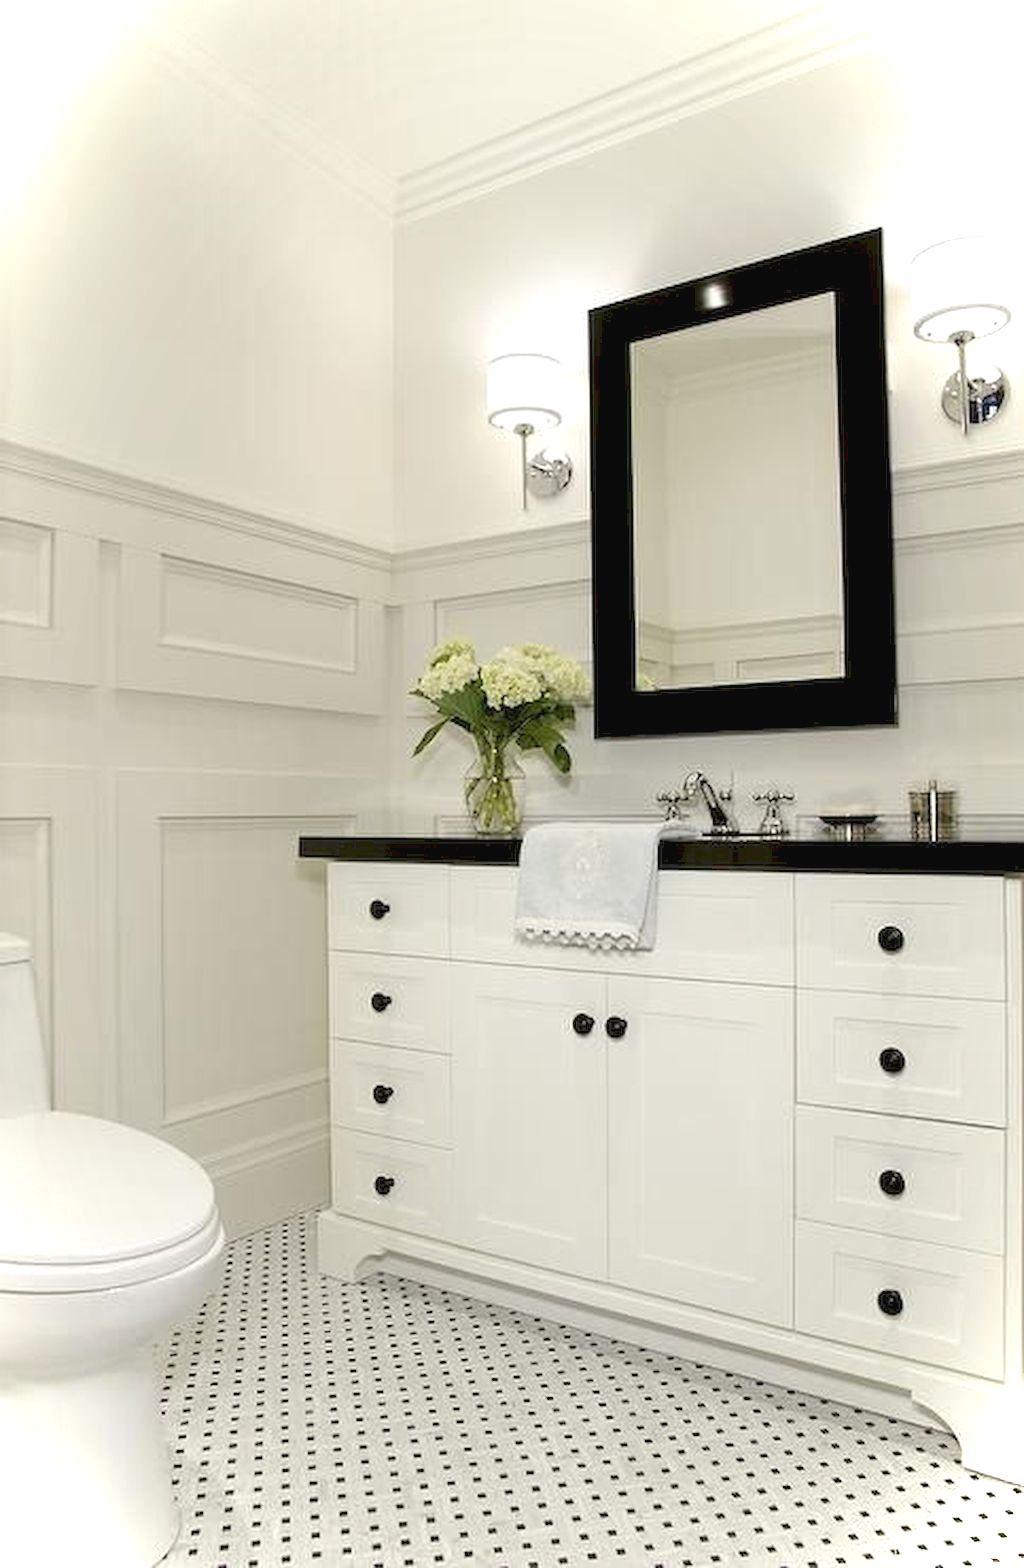 99+ Luxury Black and White Bathroom Ideas | SMALL BATHROOM AND ...